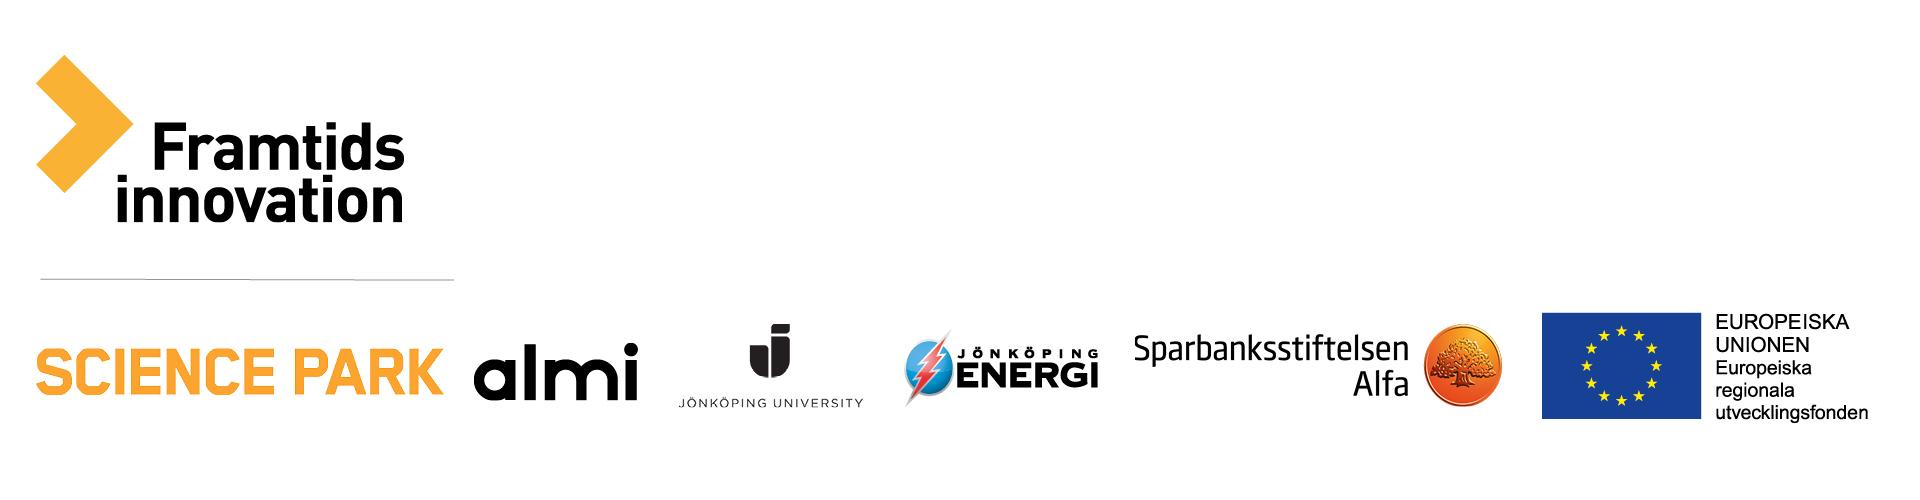 Loggor: Europeiska unionen, Science Park, Almi, Sparbankstiftelsen Alfa, Jönköping University